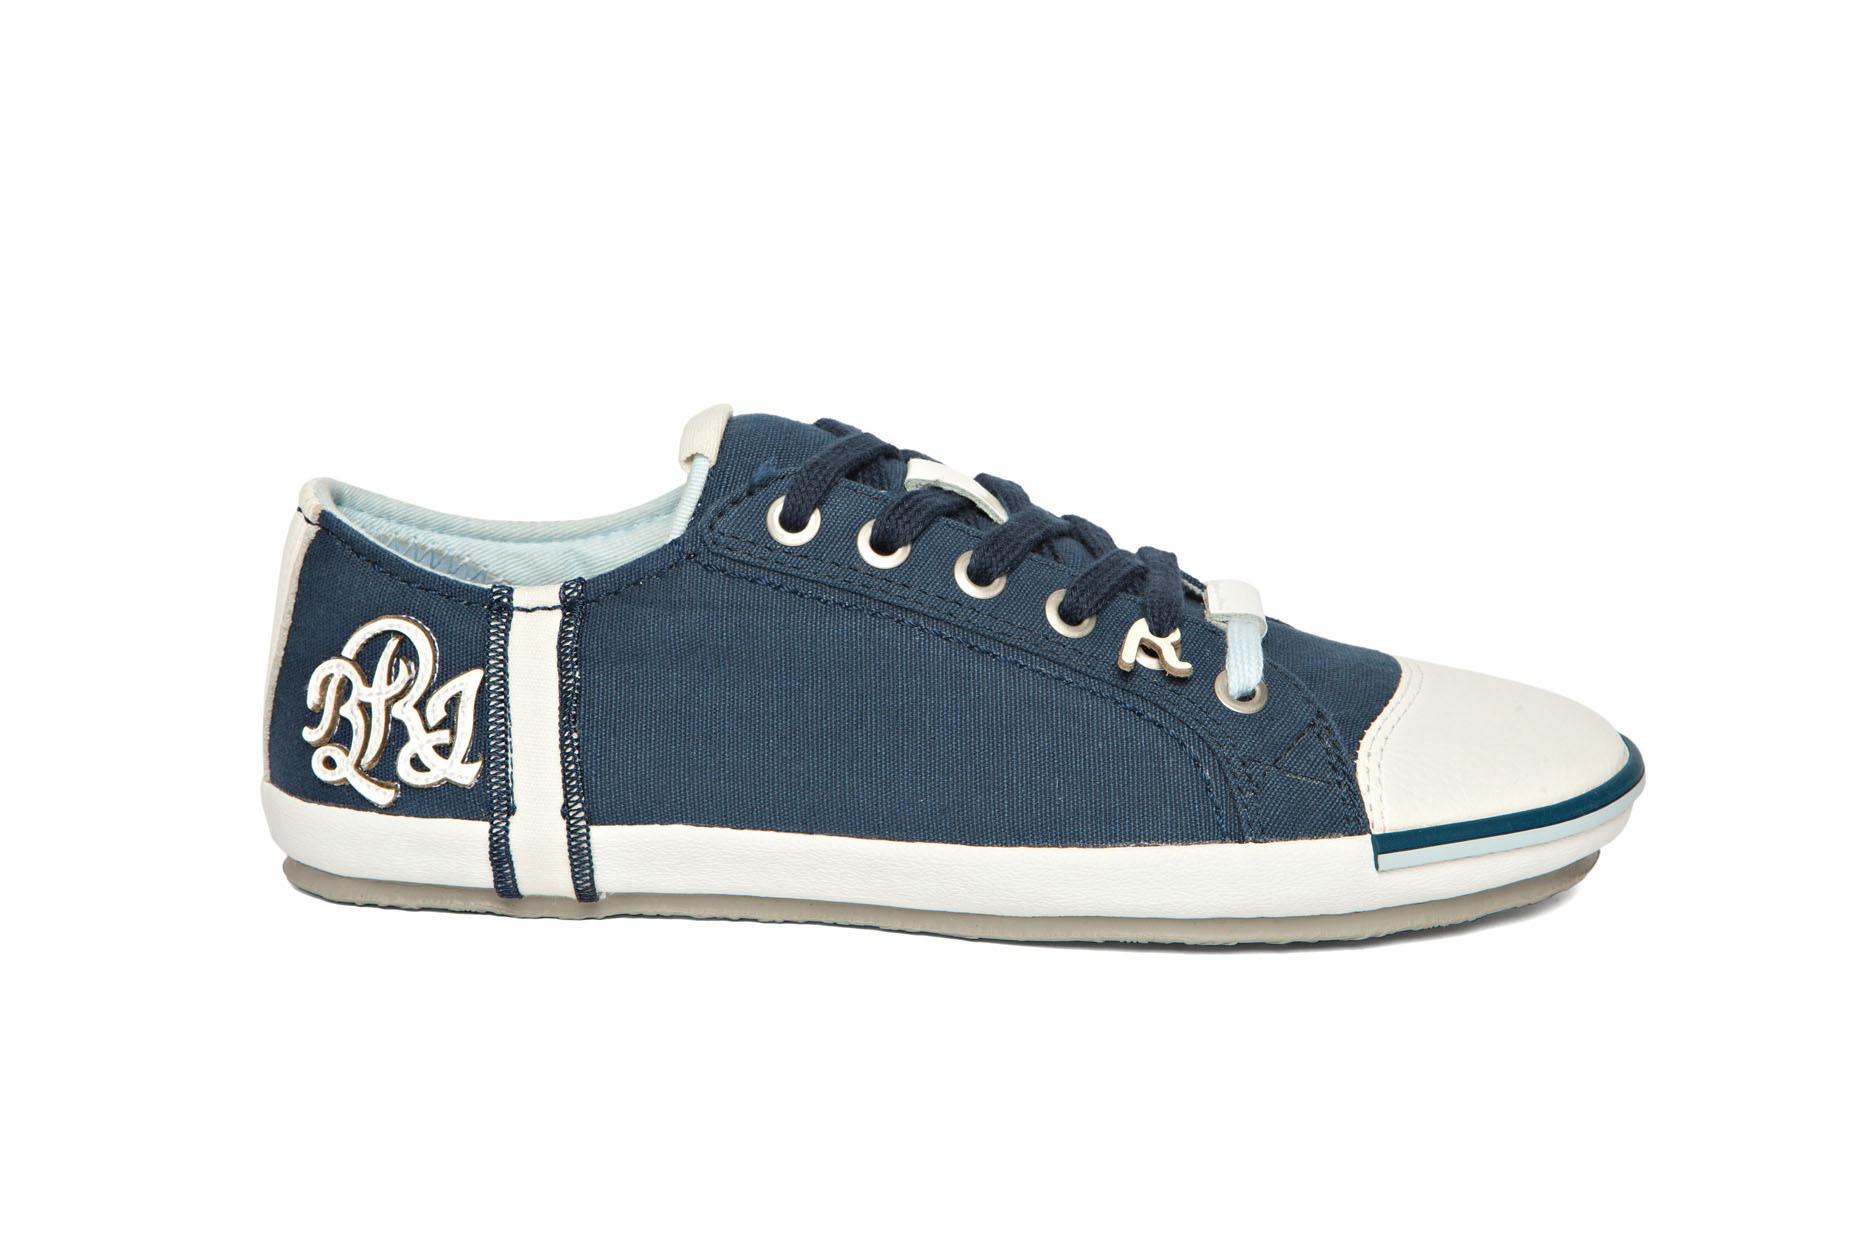 Replay Cipő - Starlette - rv140054t-0040 - Office Shoes Magyarország db6f3eb565